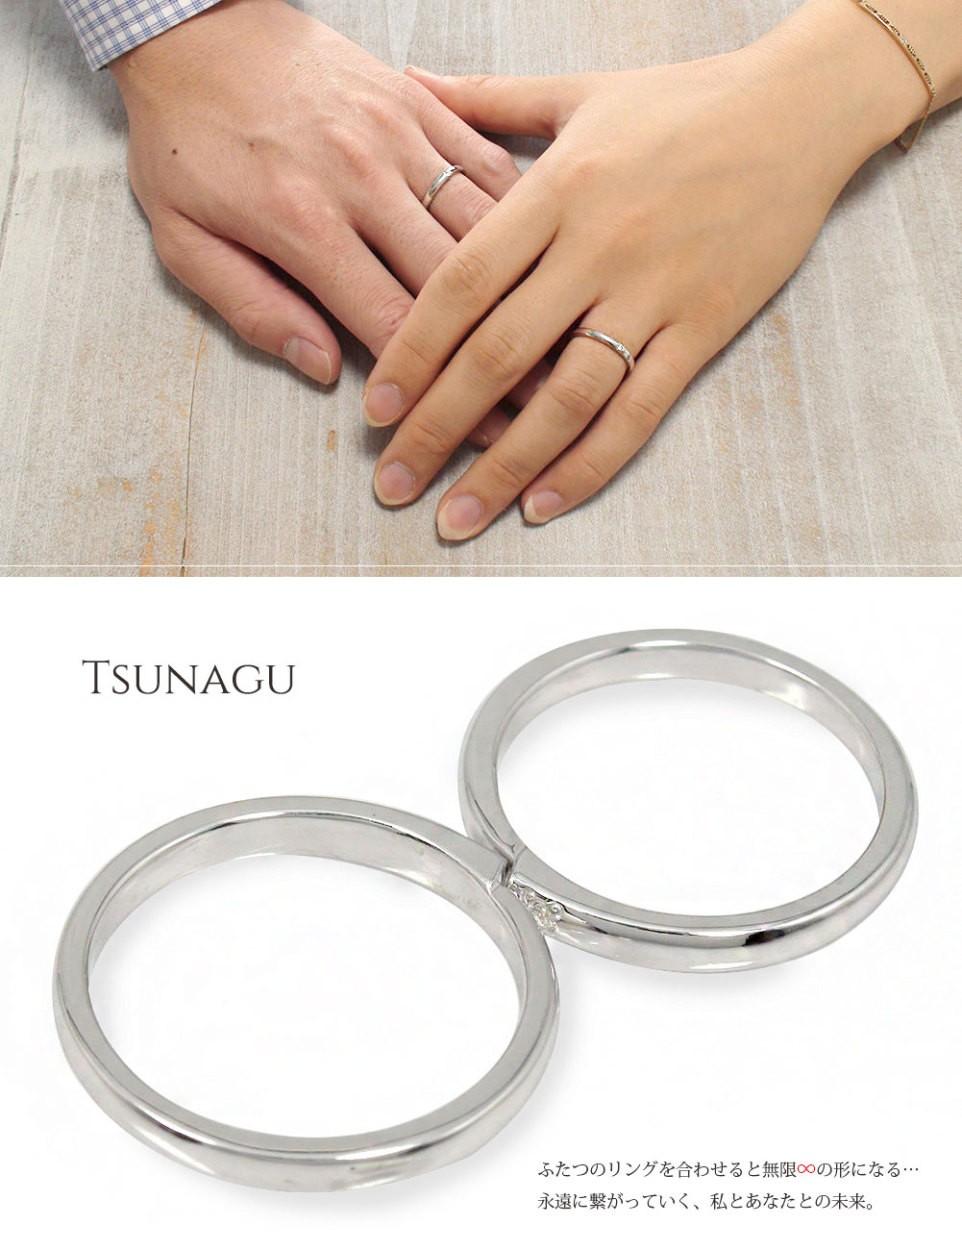 TSUNAGU(ツナグ)「永遠に繋がっていく」リング | 【Yahoo】ジュエリー工房アルマ